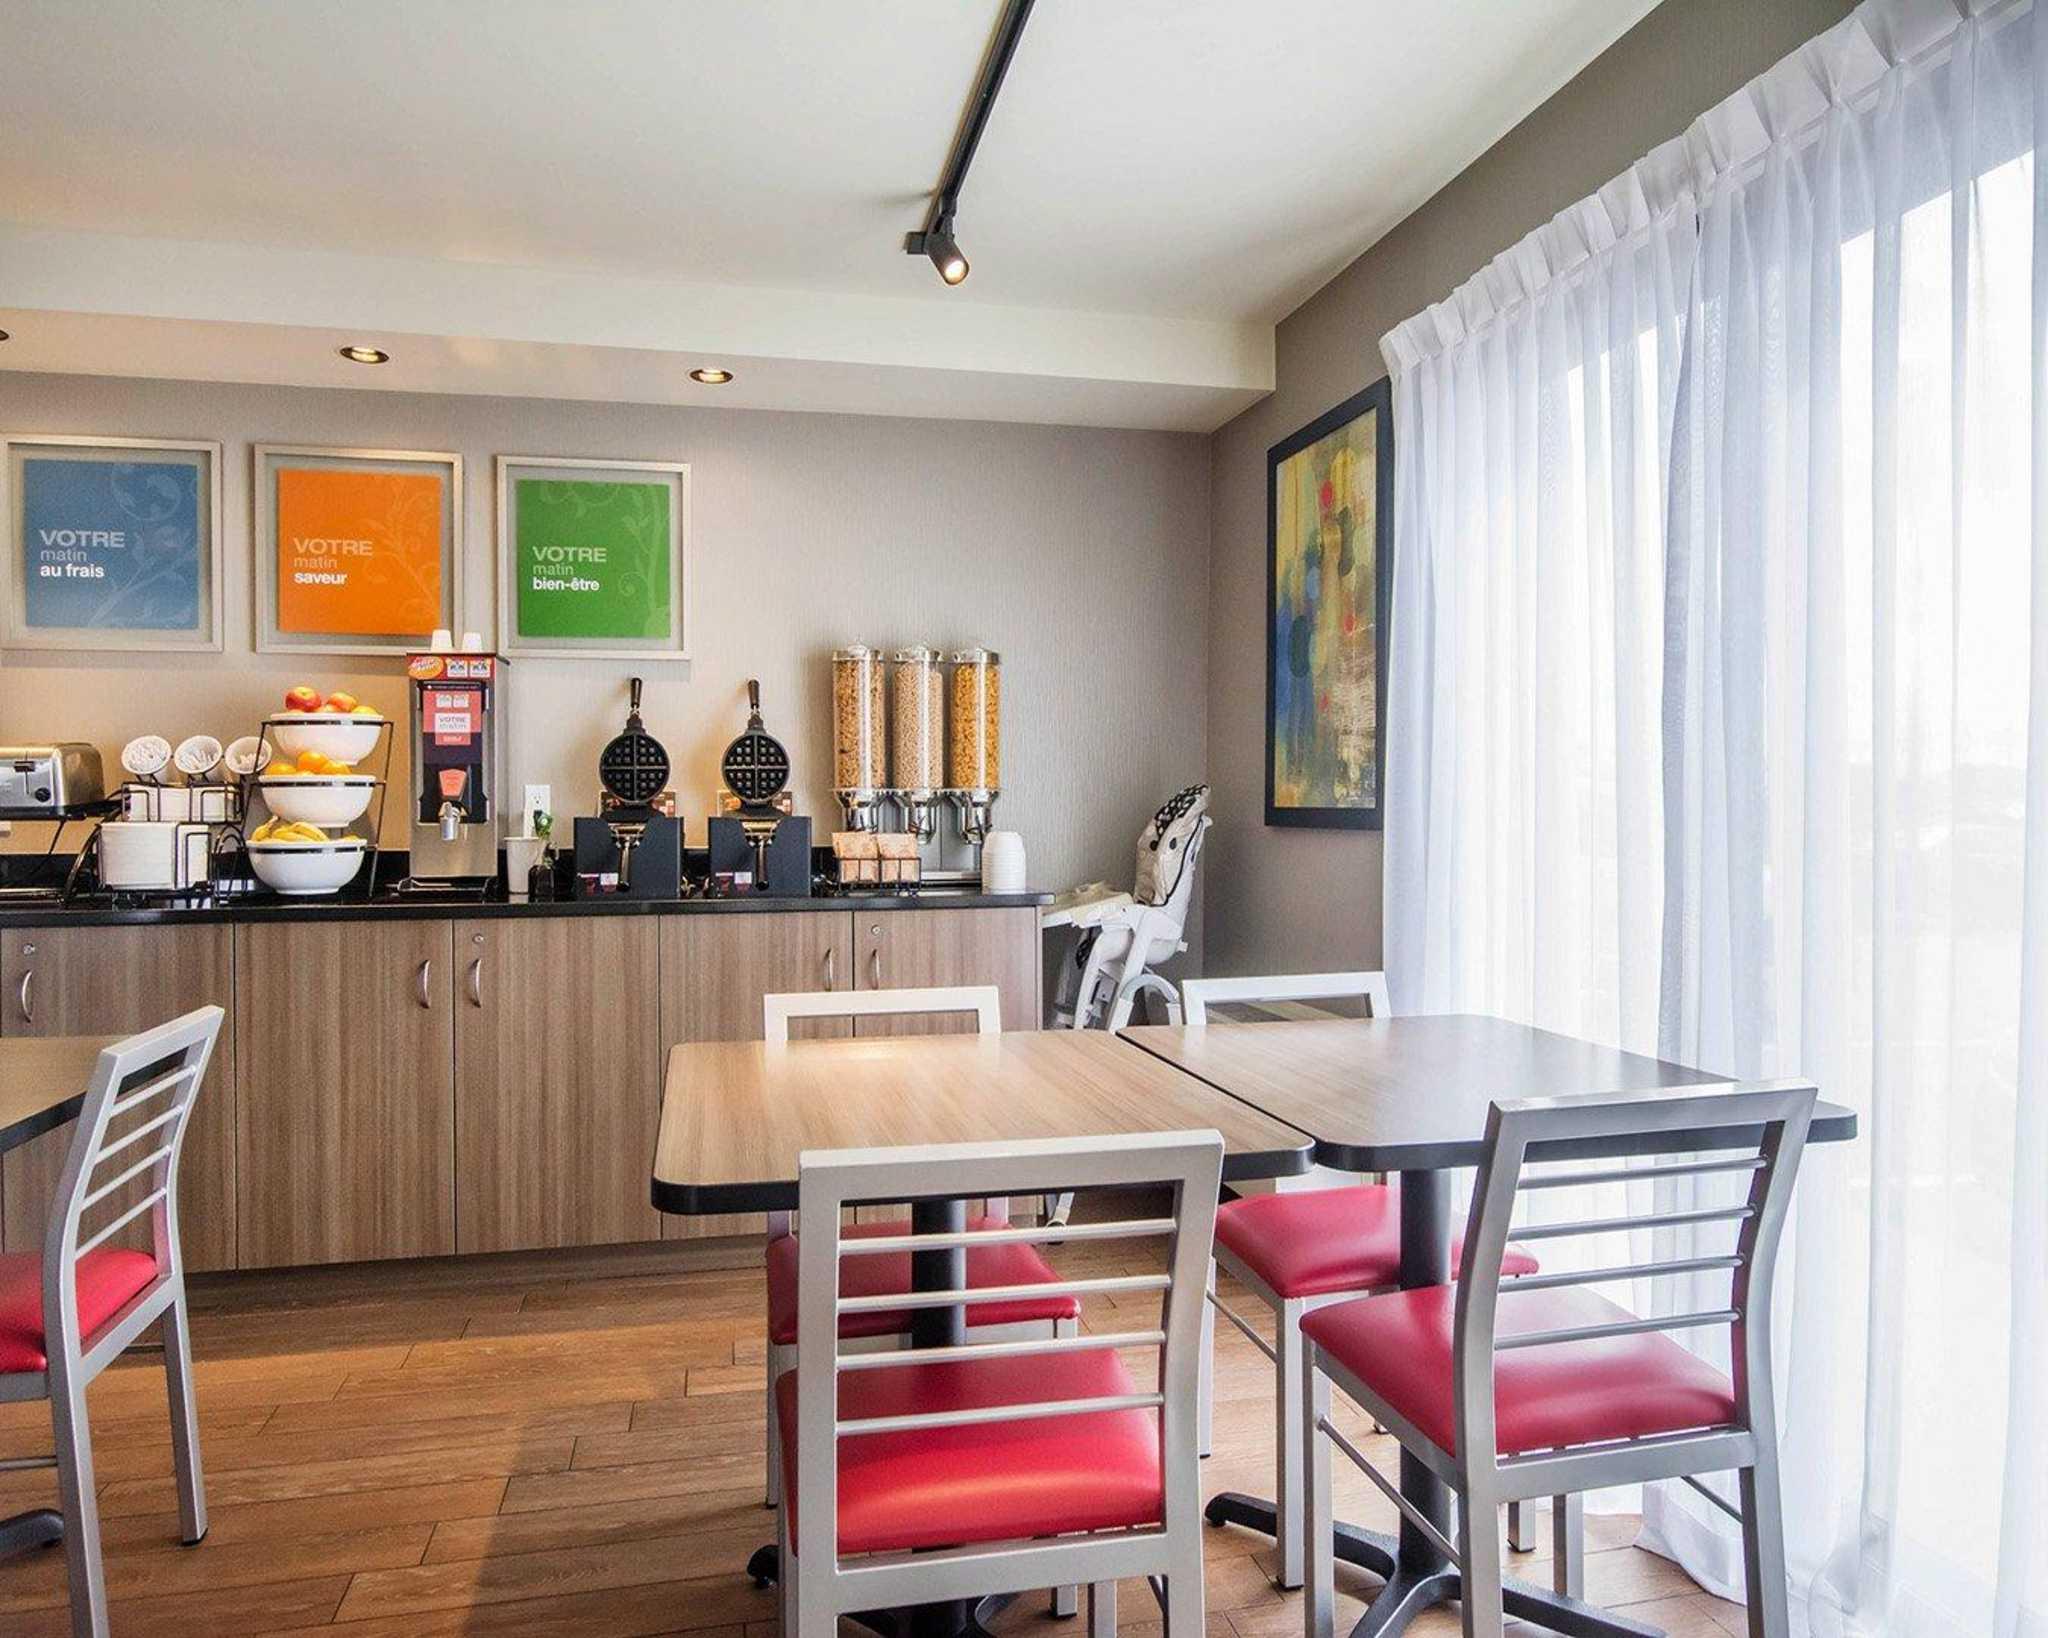 Comfort Inn à Baie-Comeau